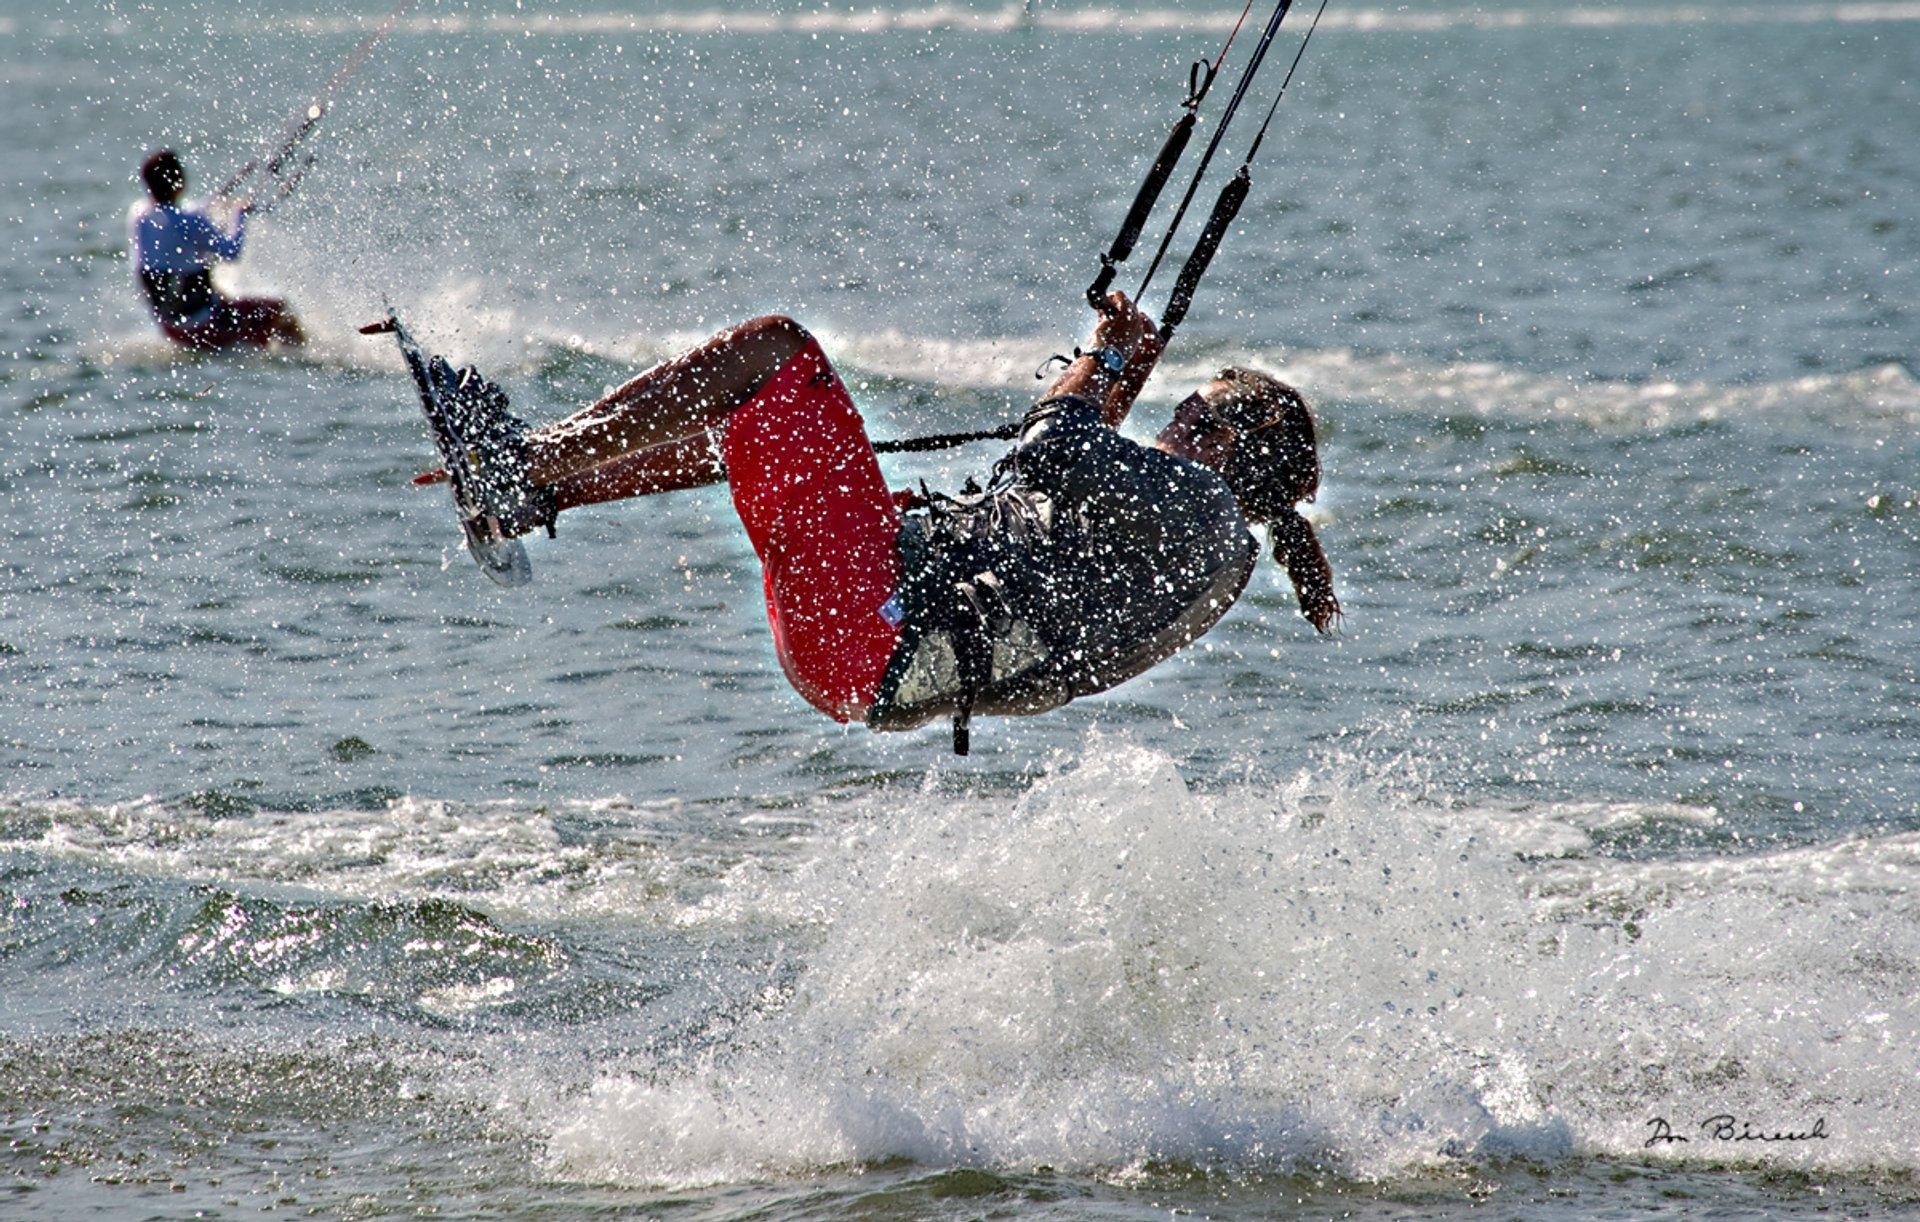 Kitesurfing near the Tampa Bay Bridge 2020